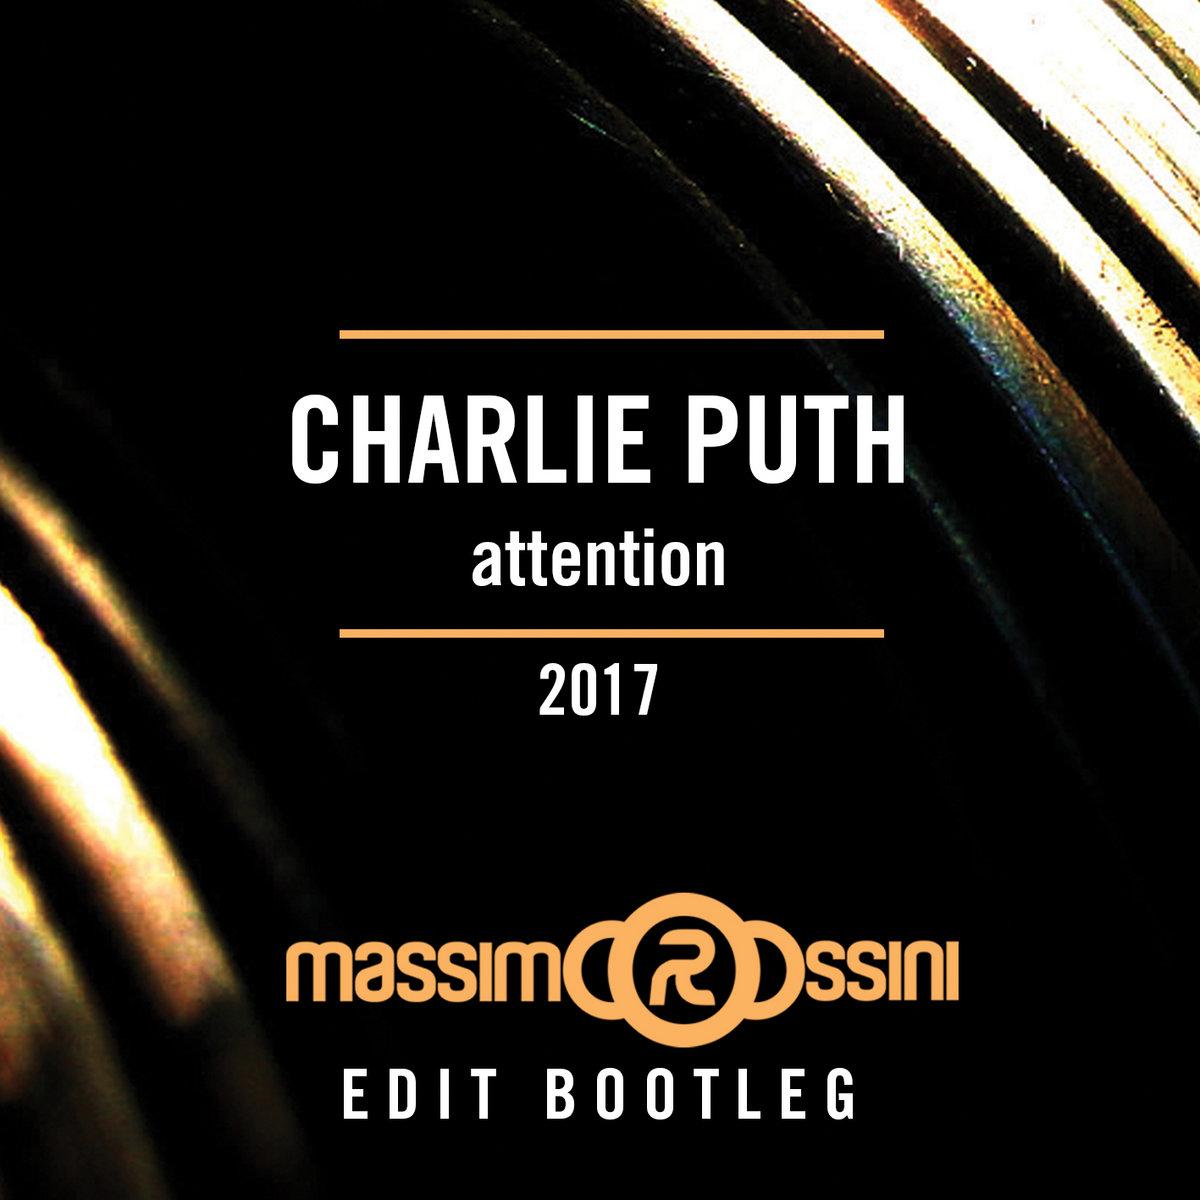 CHARLIE PUTH - Attention (ROSSINI Edit Bootleg) | Massimo